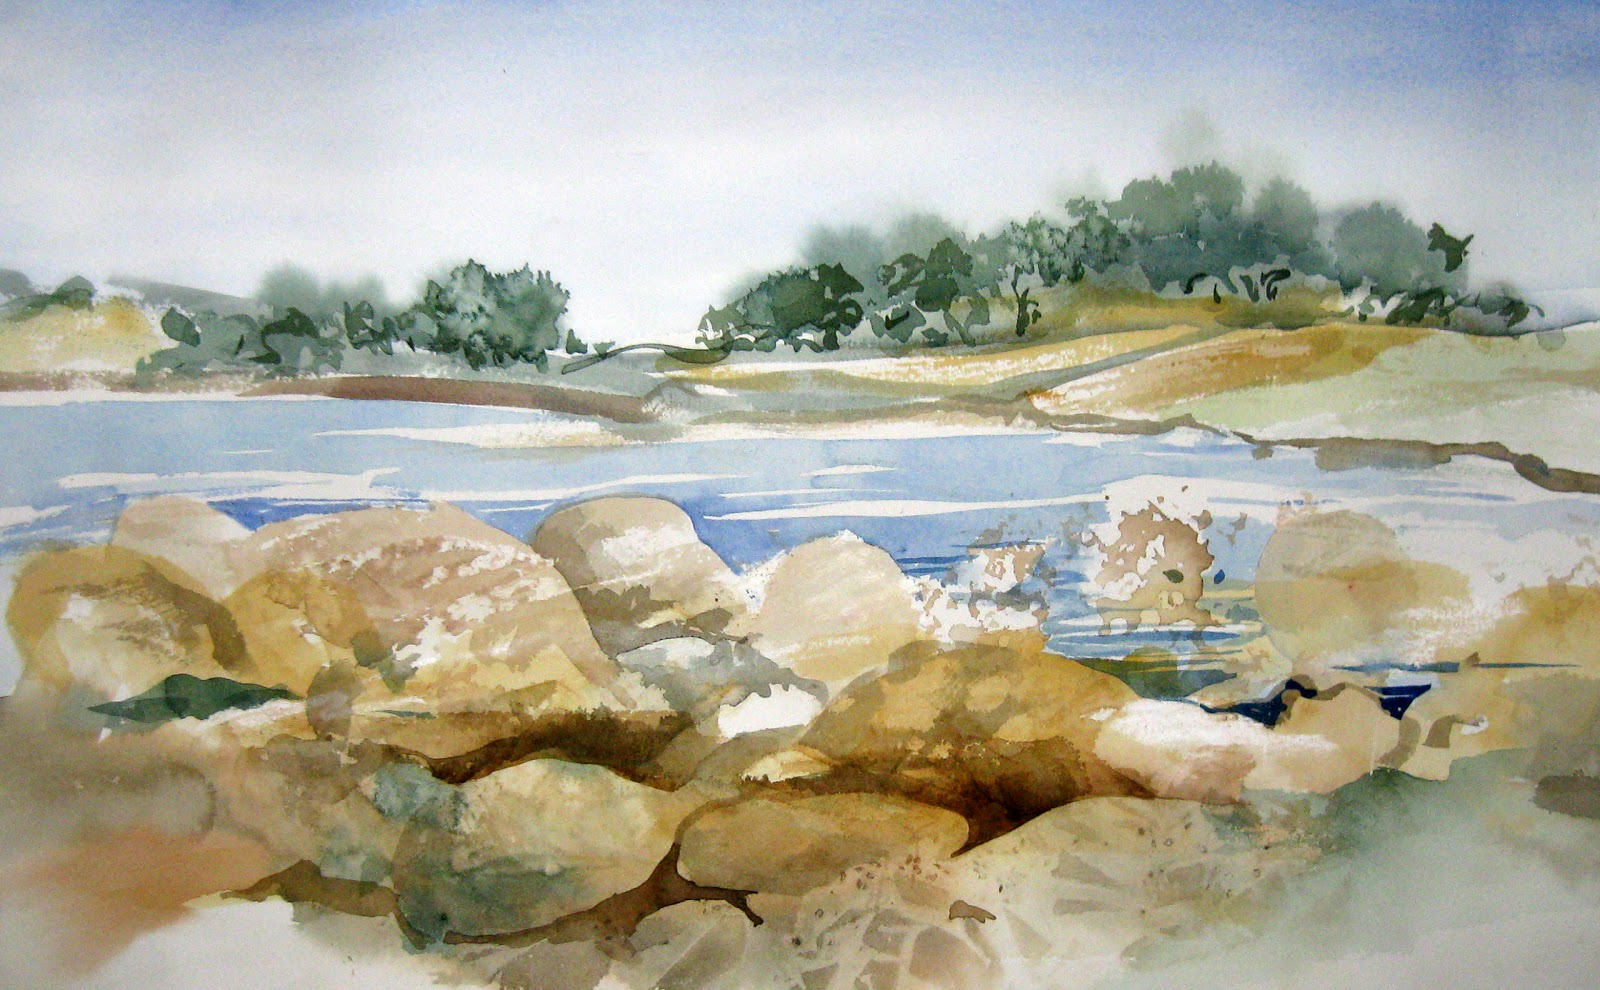 Painting Rocks In Watercolor